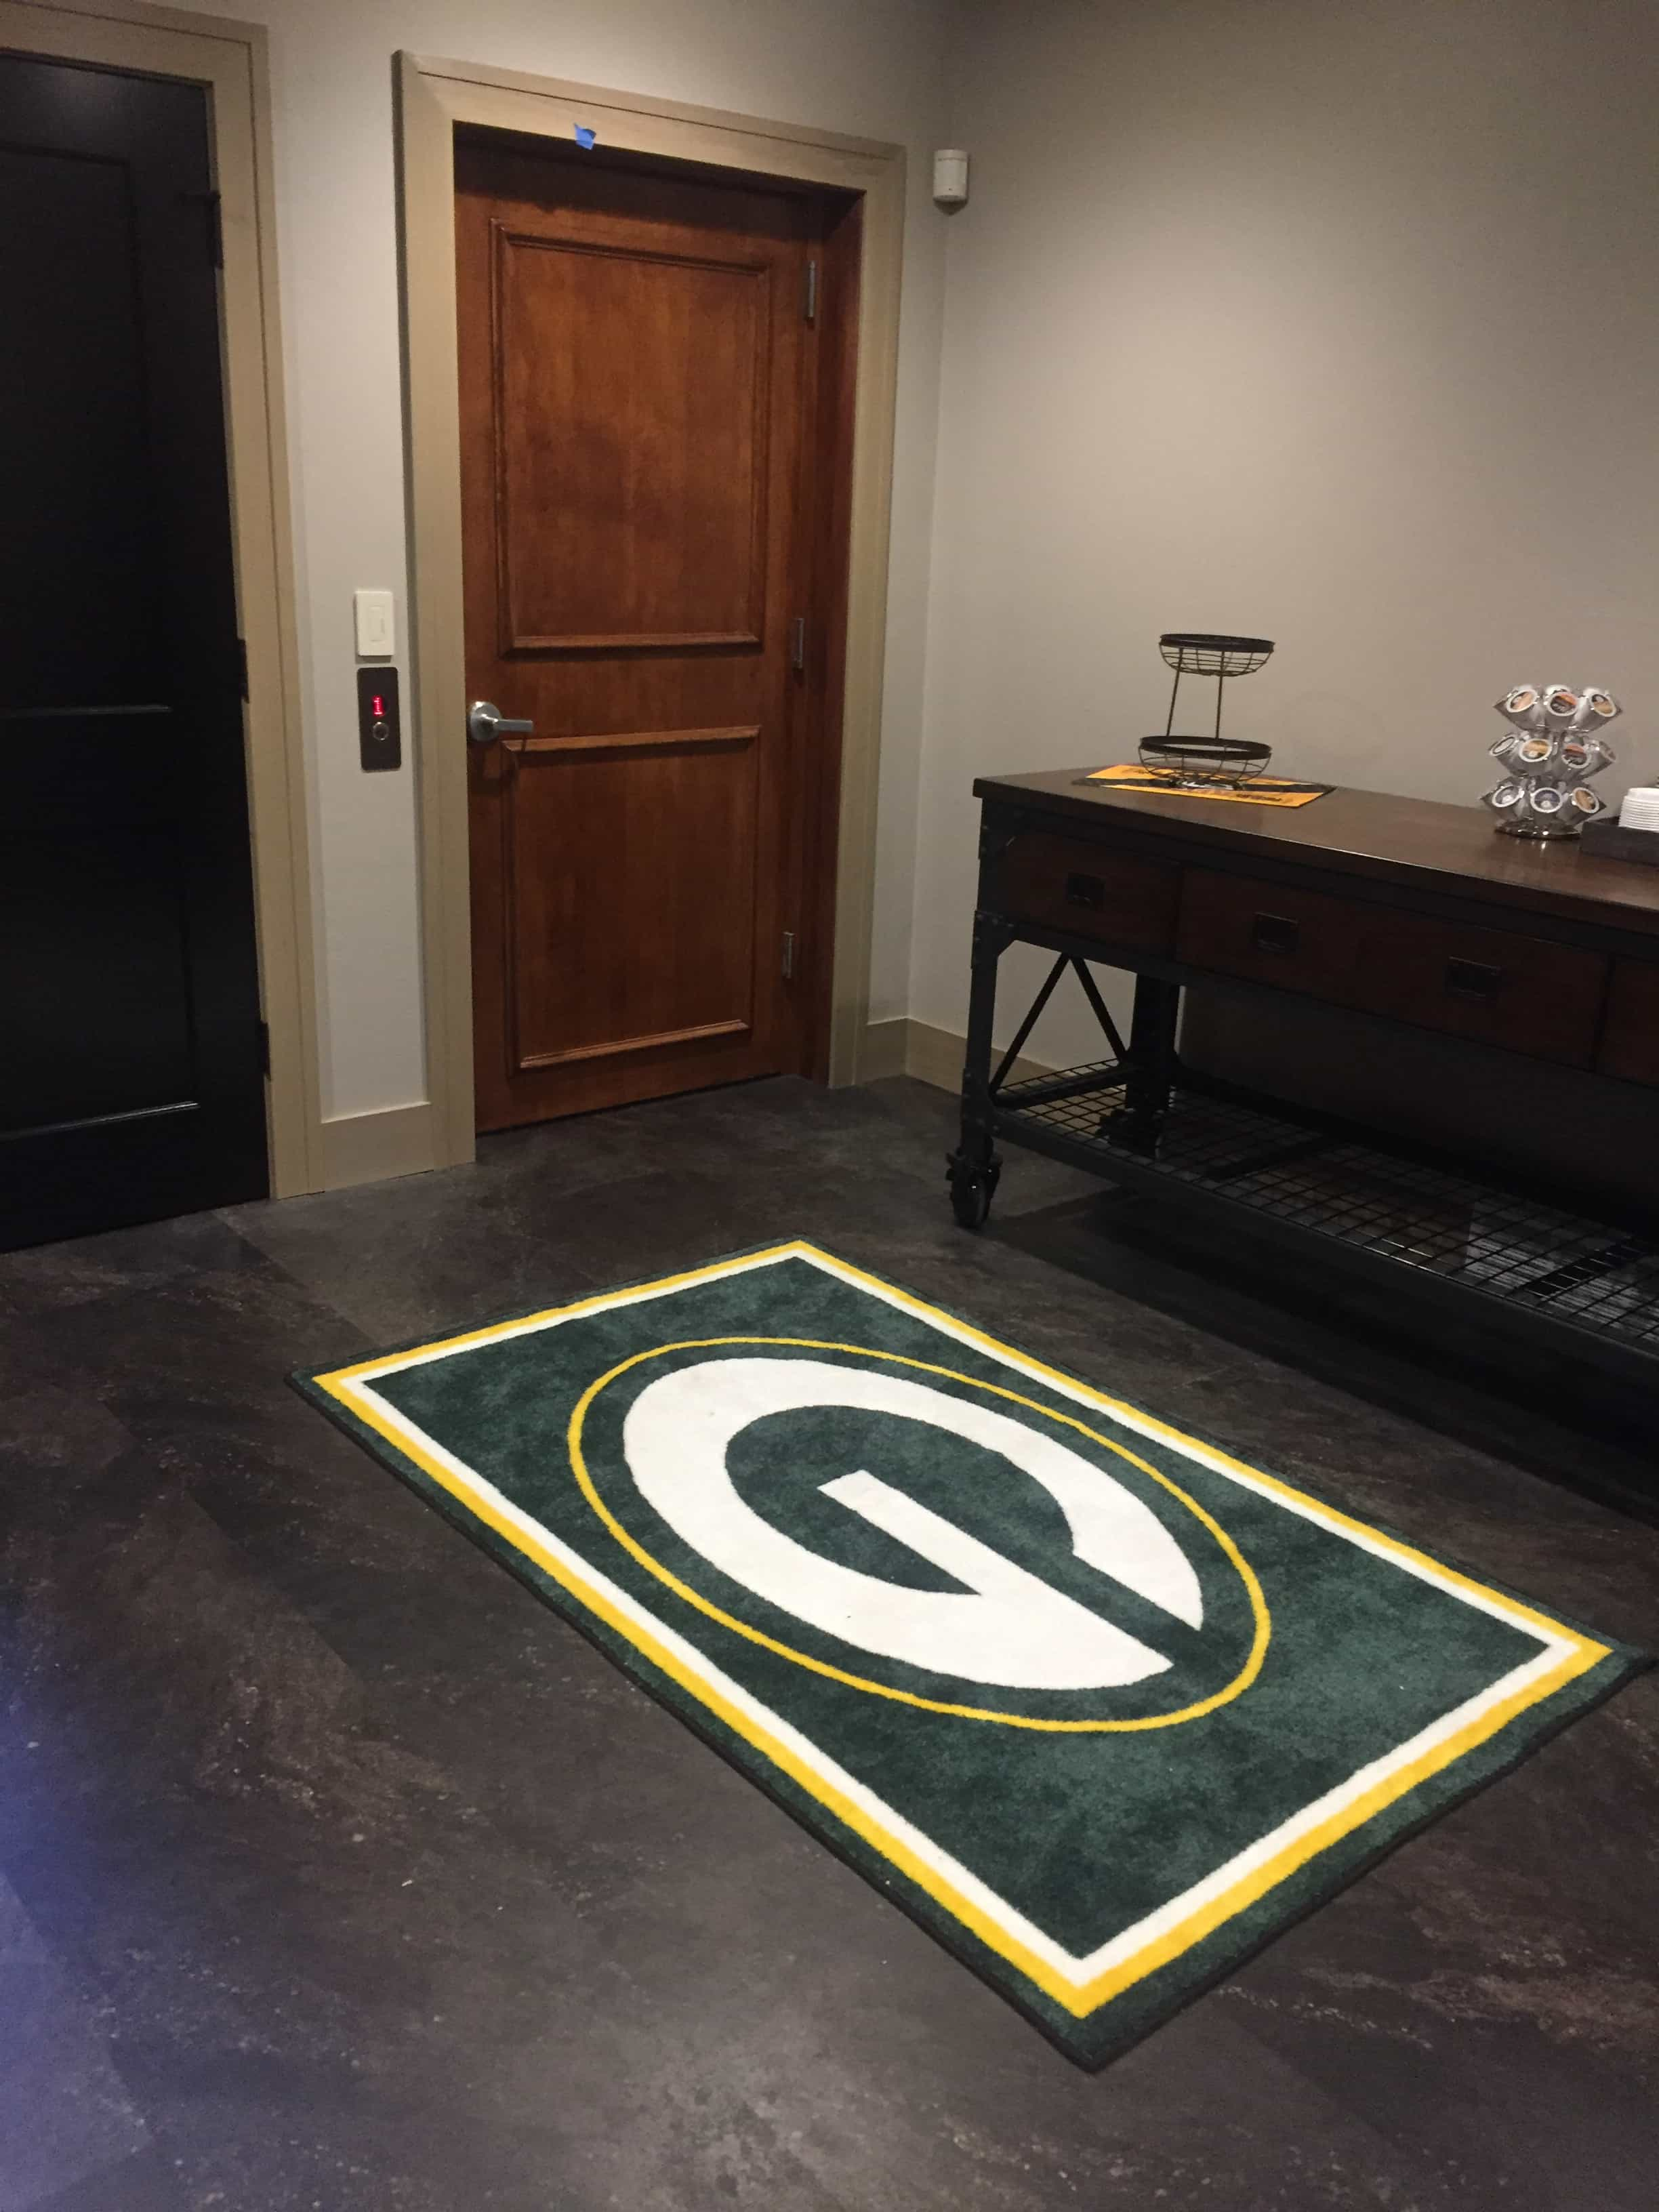 Wisconsin_Residential_Elevator-min.jpg